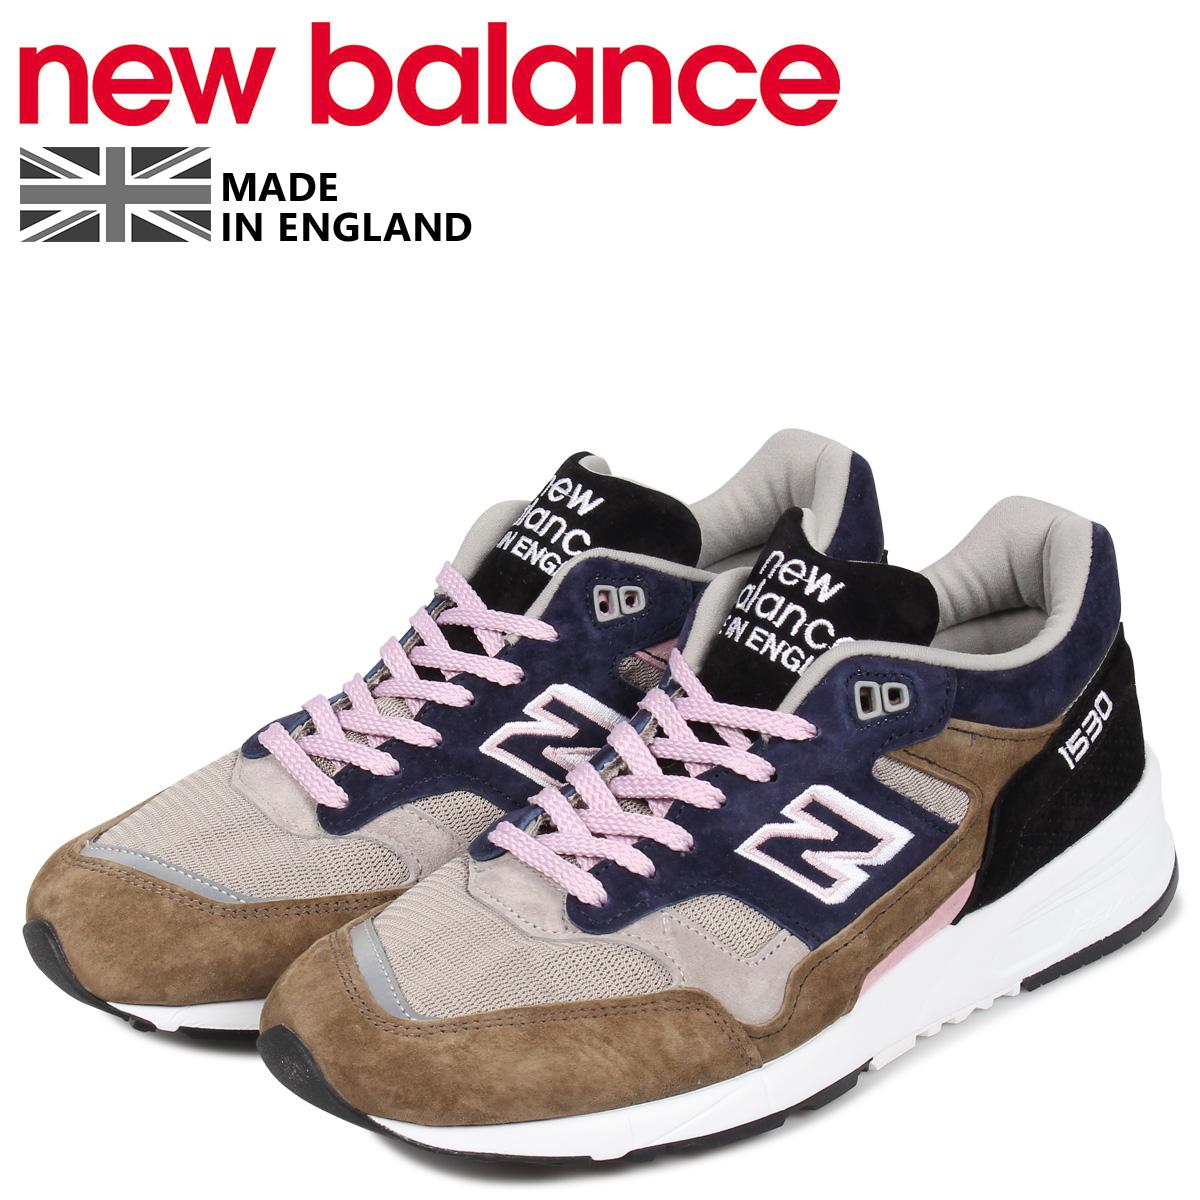 new balance 1530